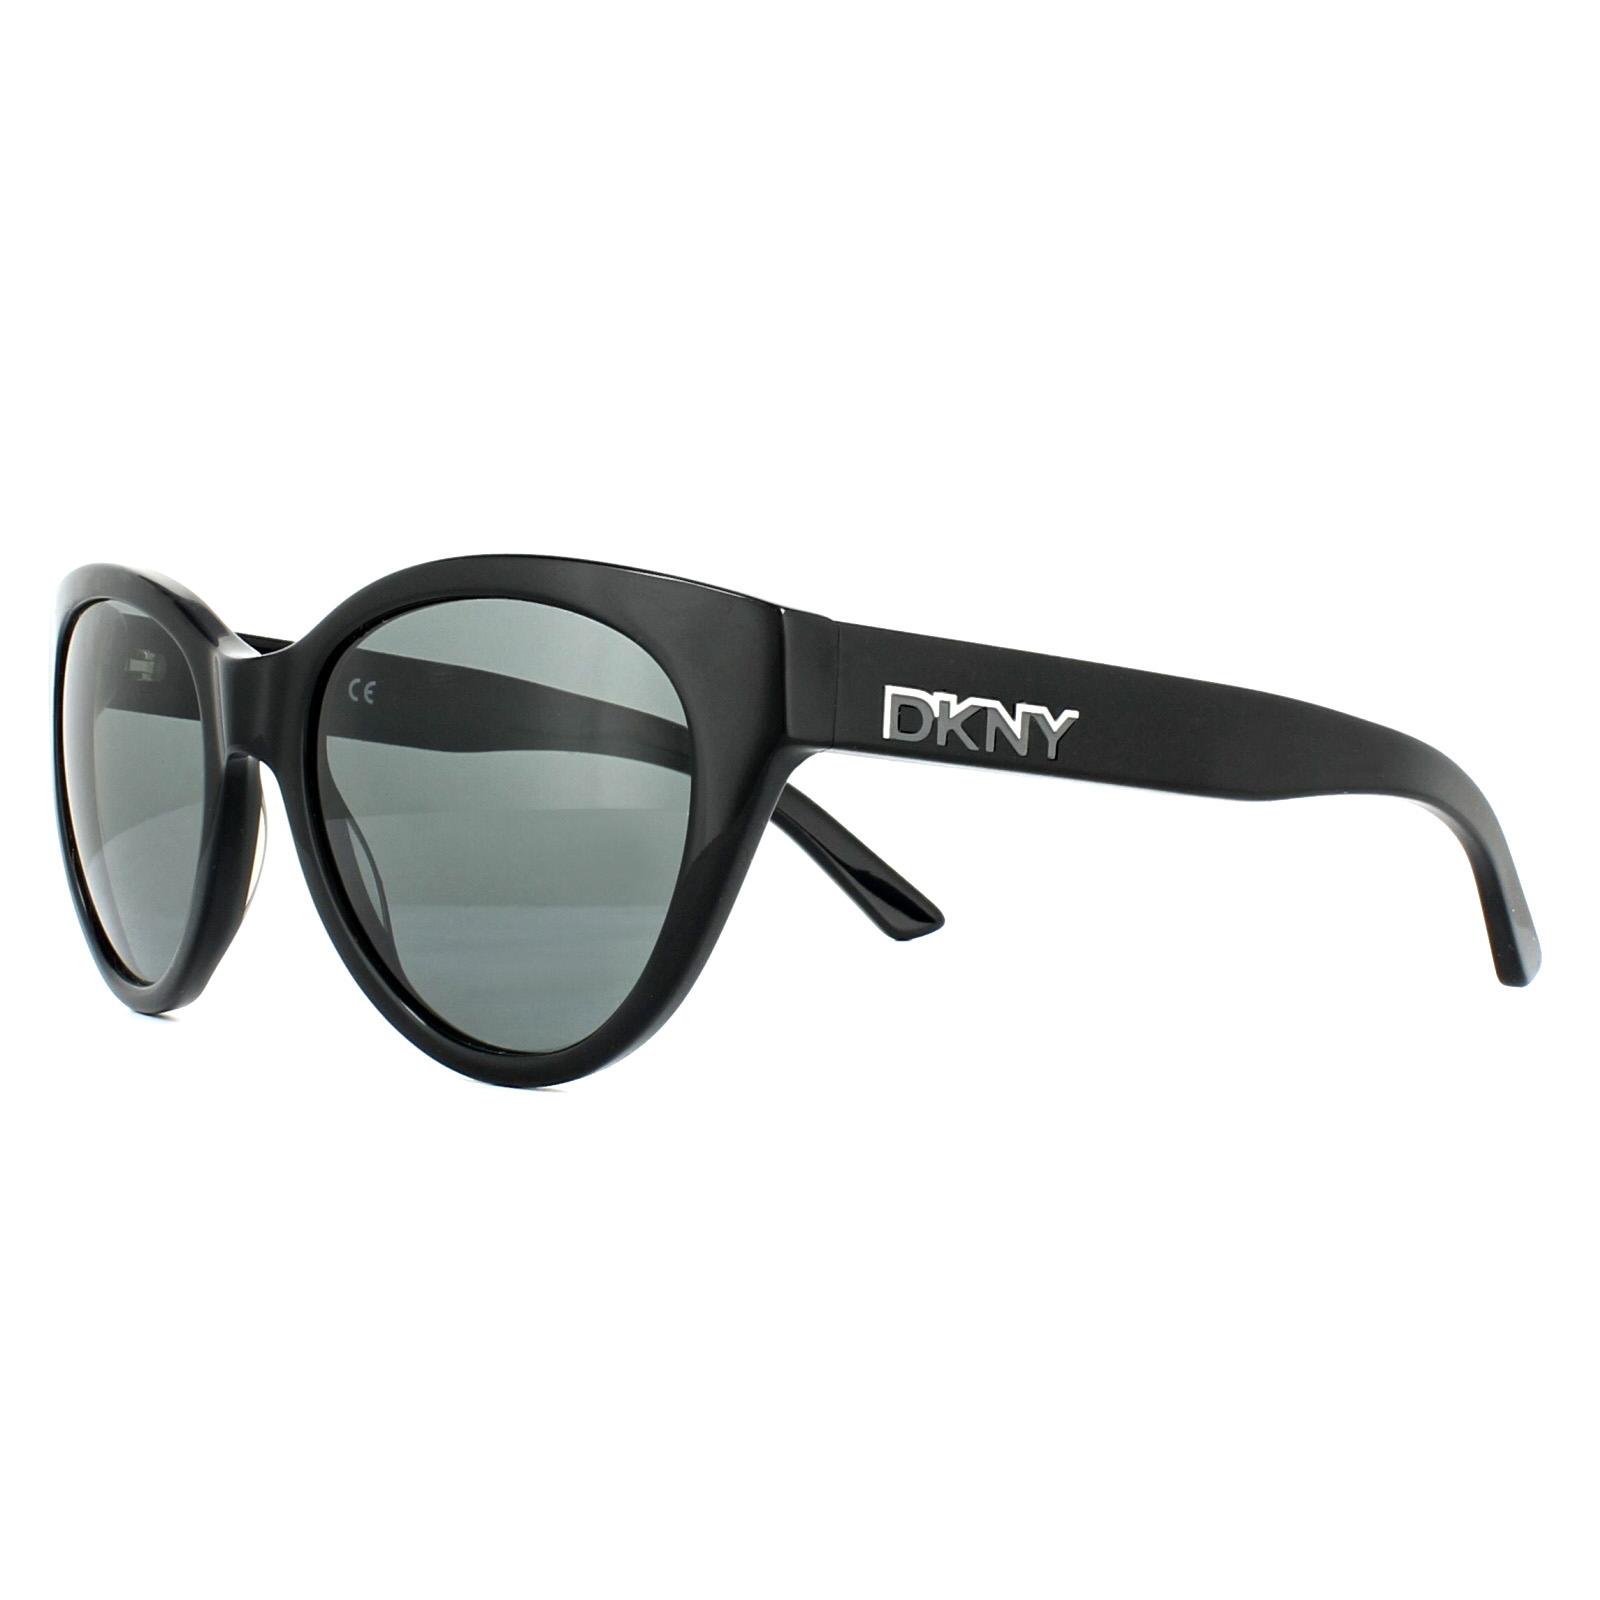 baa0cd361c71 Cheap DKNY 4135 Sunglasses - Discounted Sunglasses